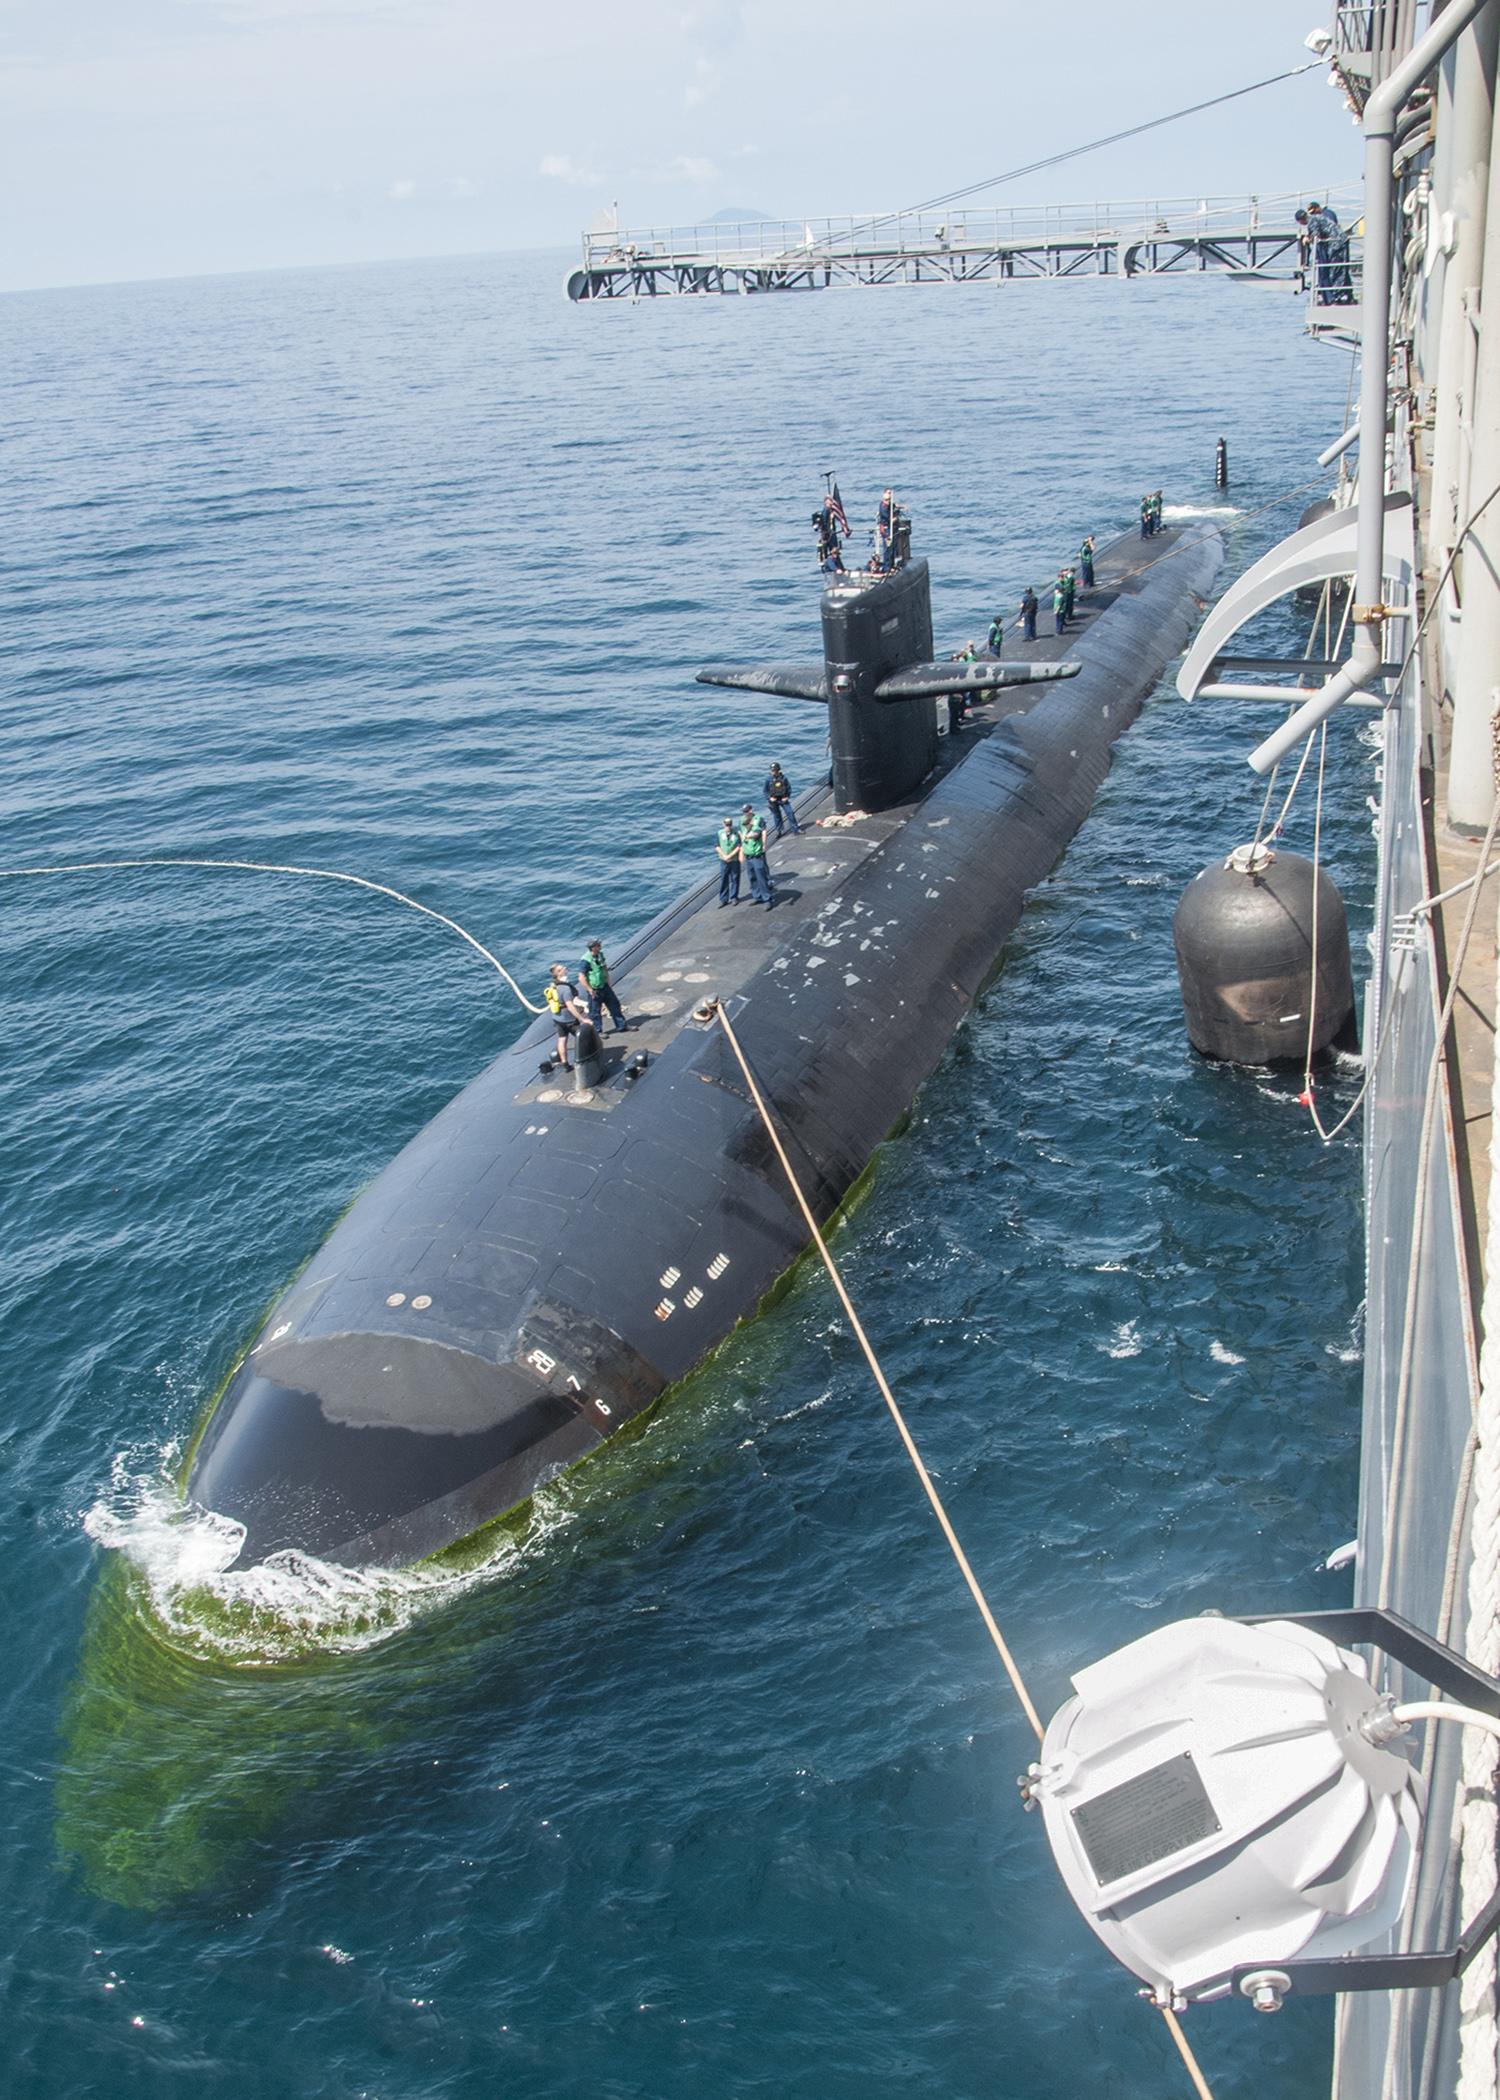 Submarine And Submarine Tender Moor Together In Phuket